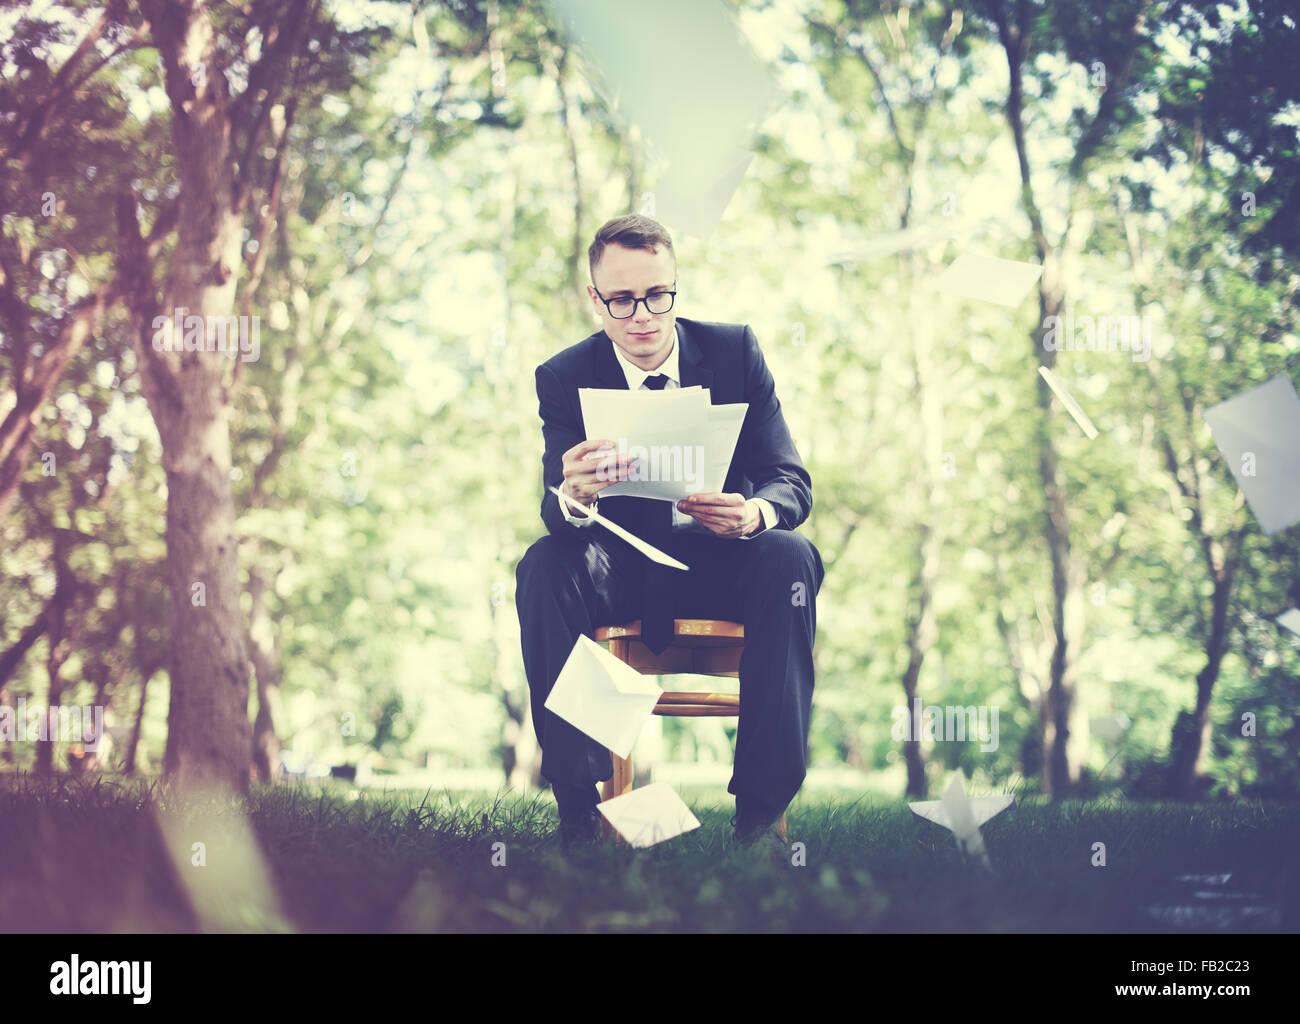 Businessman Stressful Sadness Failure Concept - Stock Image